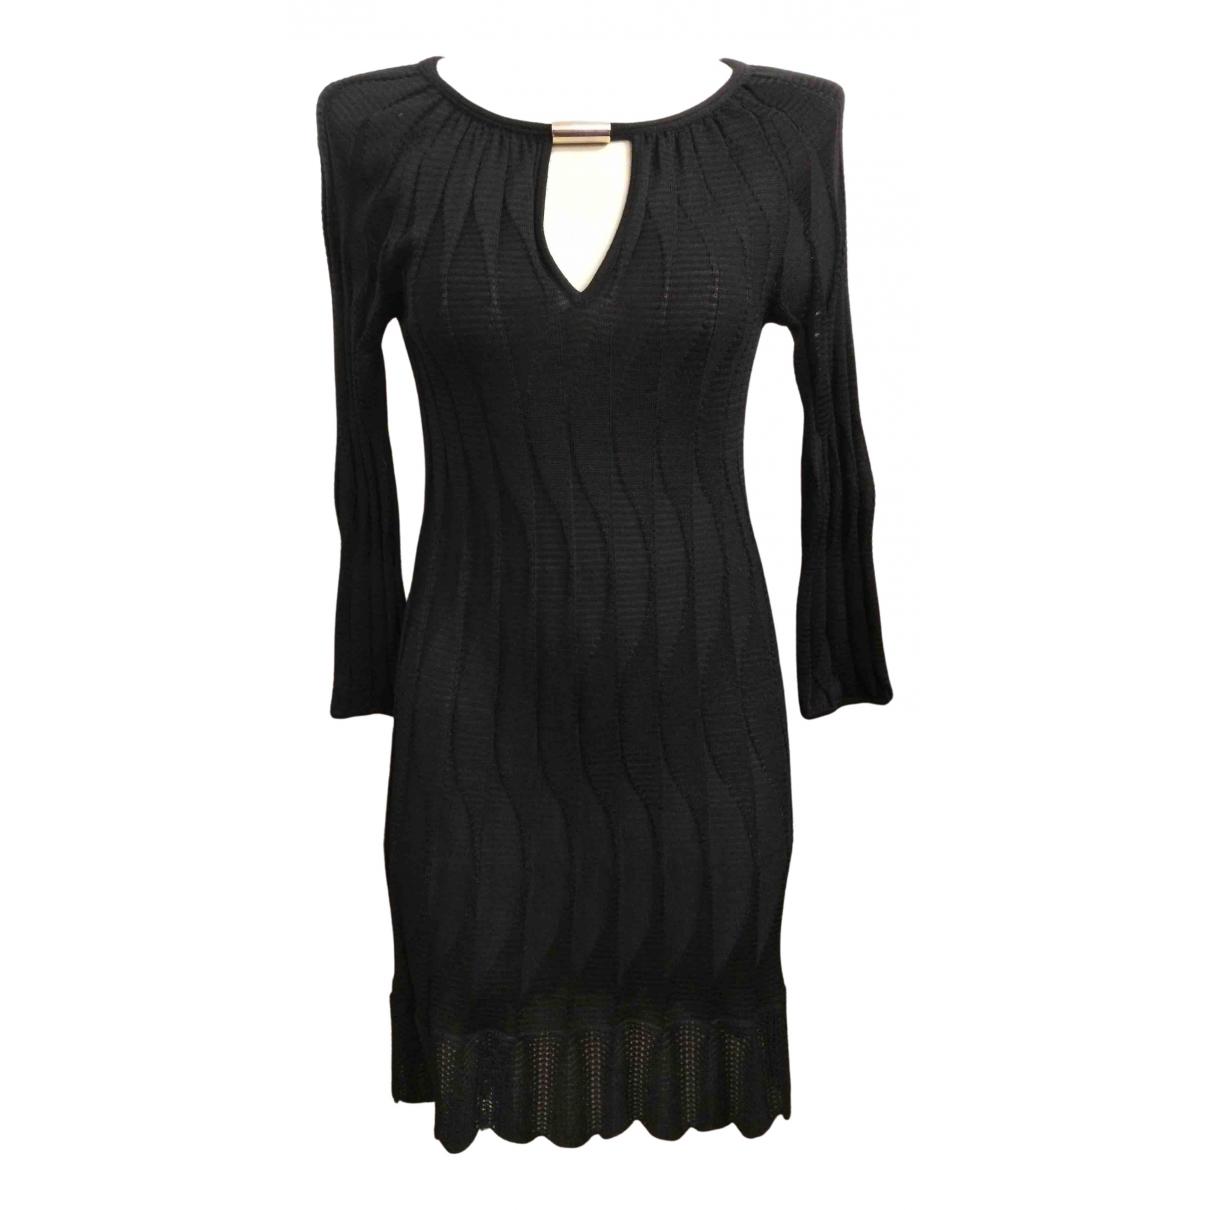 M Missoni N Black dress for Women 40 IT